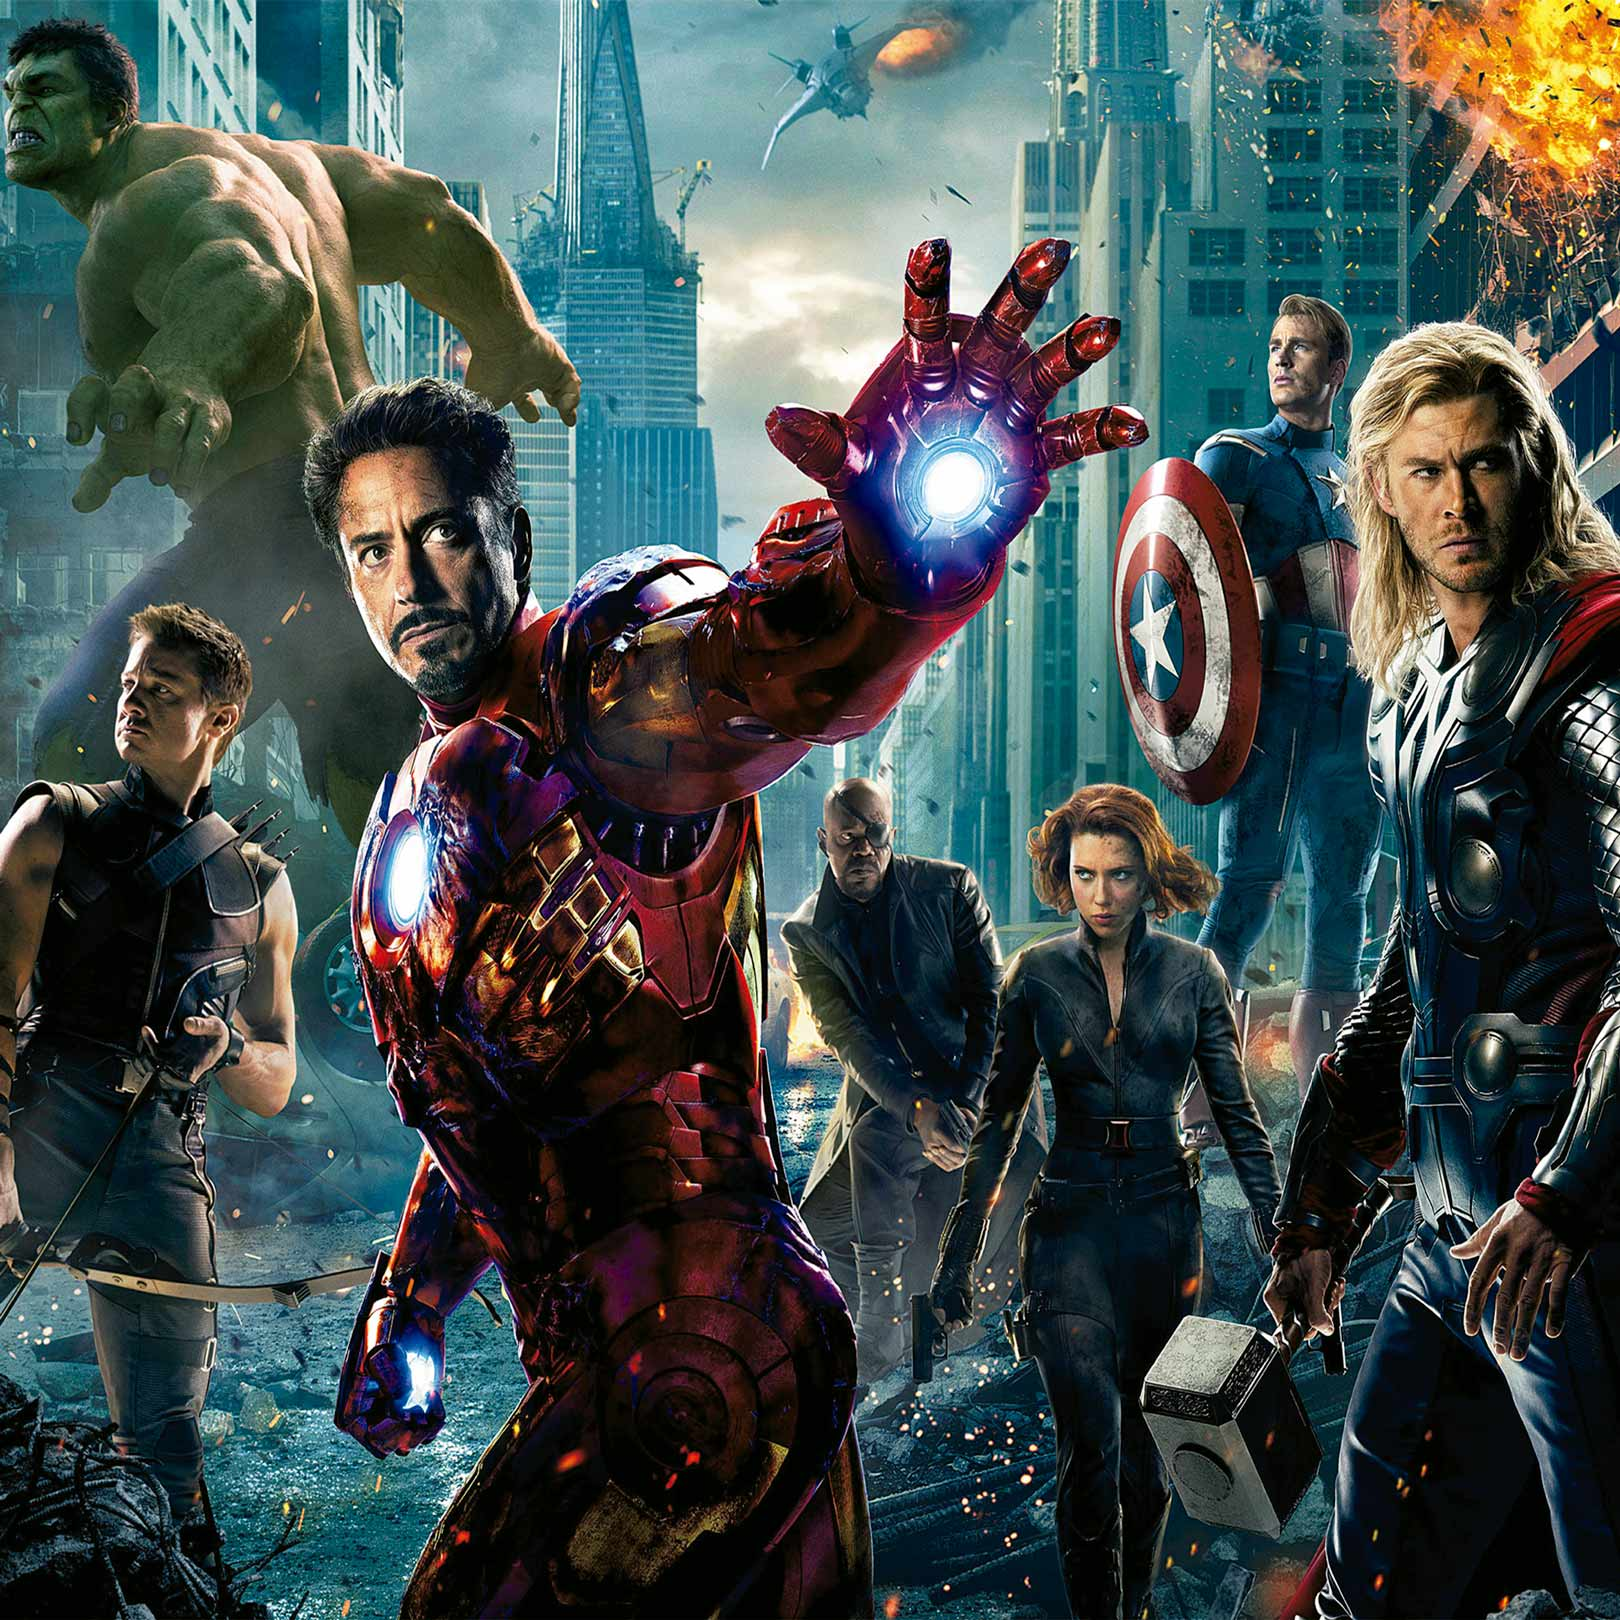 Papel De Parede Adesivo Vingadores Infantil Equipe Marvel  - Final Decor